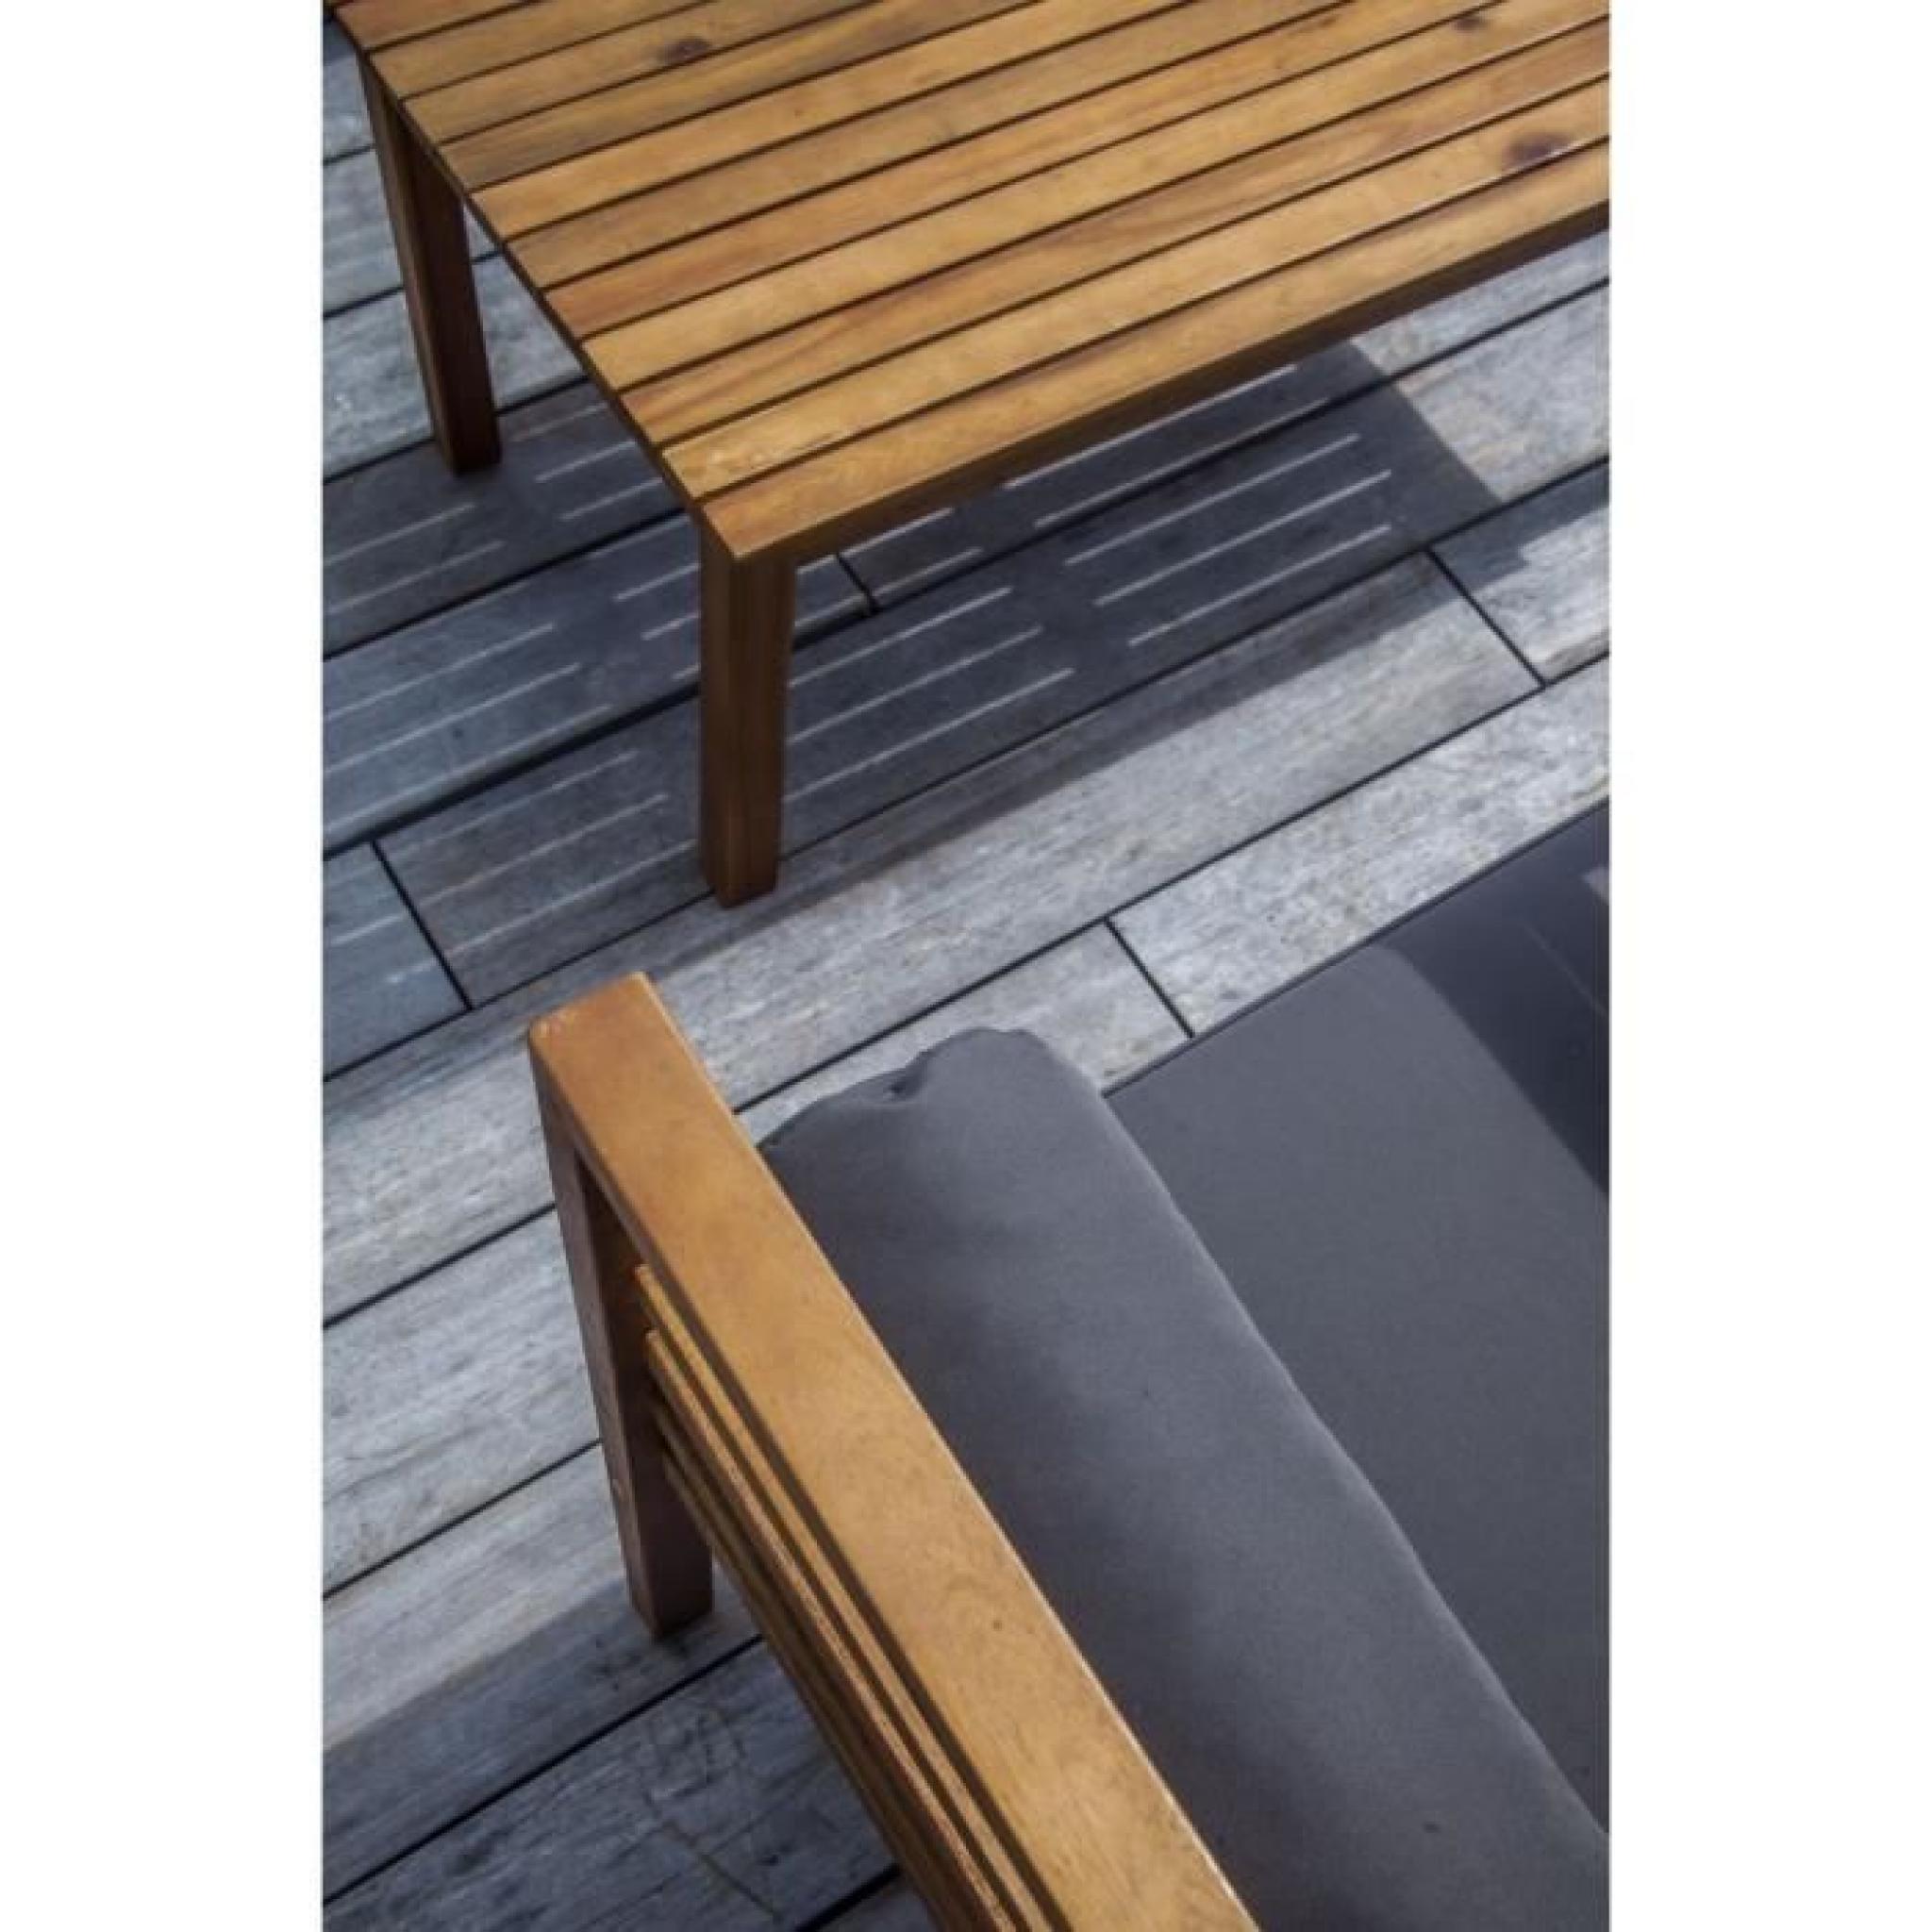 MAJORQUE Salon de jardin 4 places en bois acacia - Marron - Achat ...